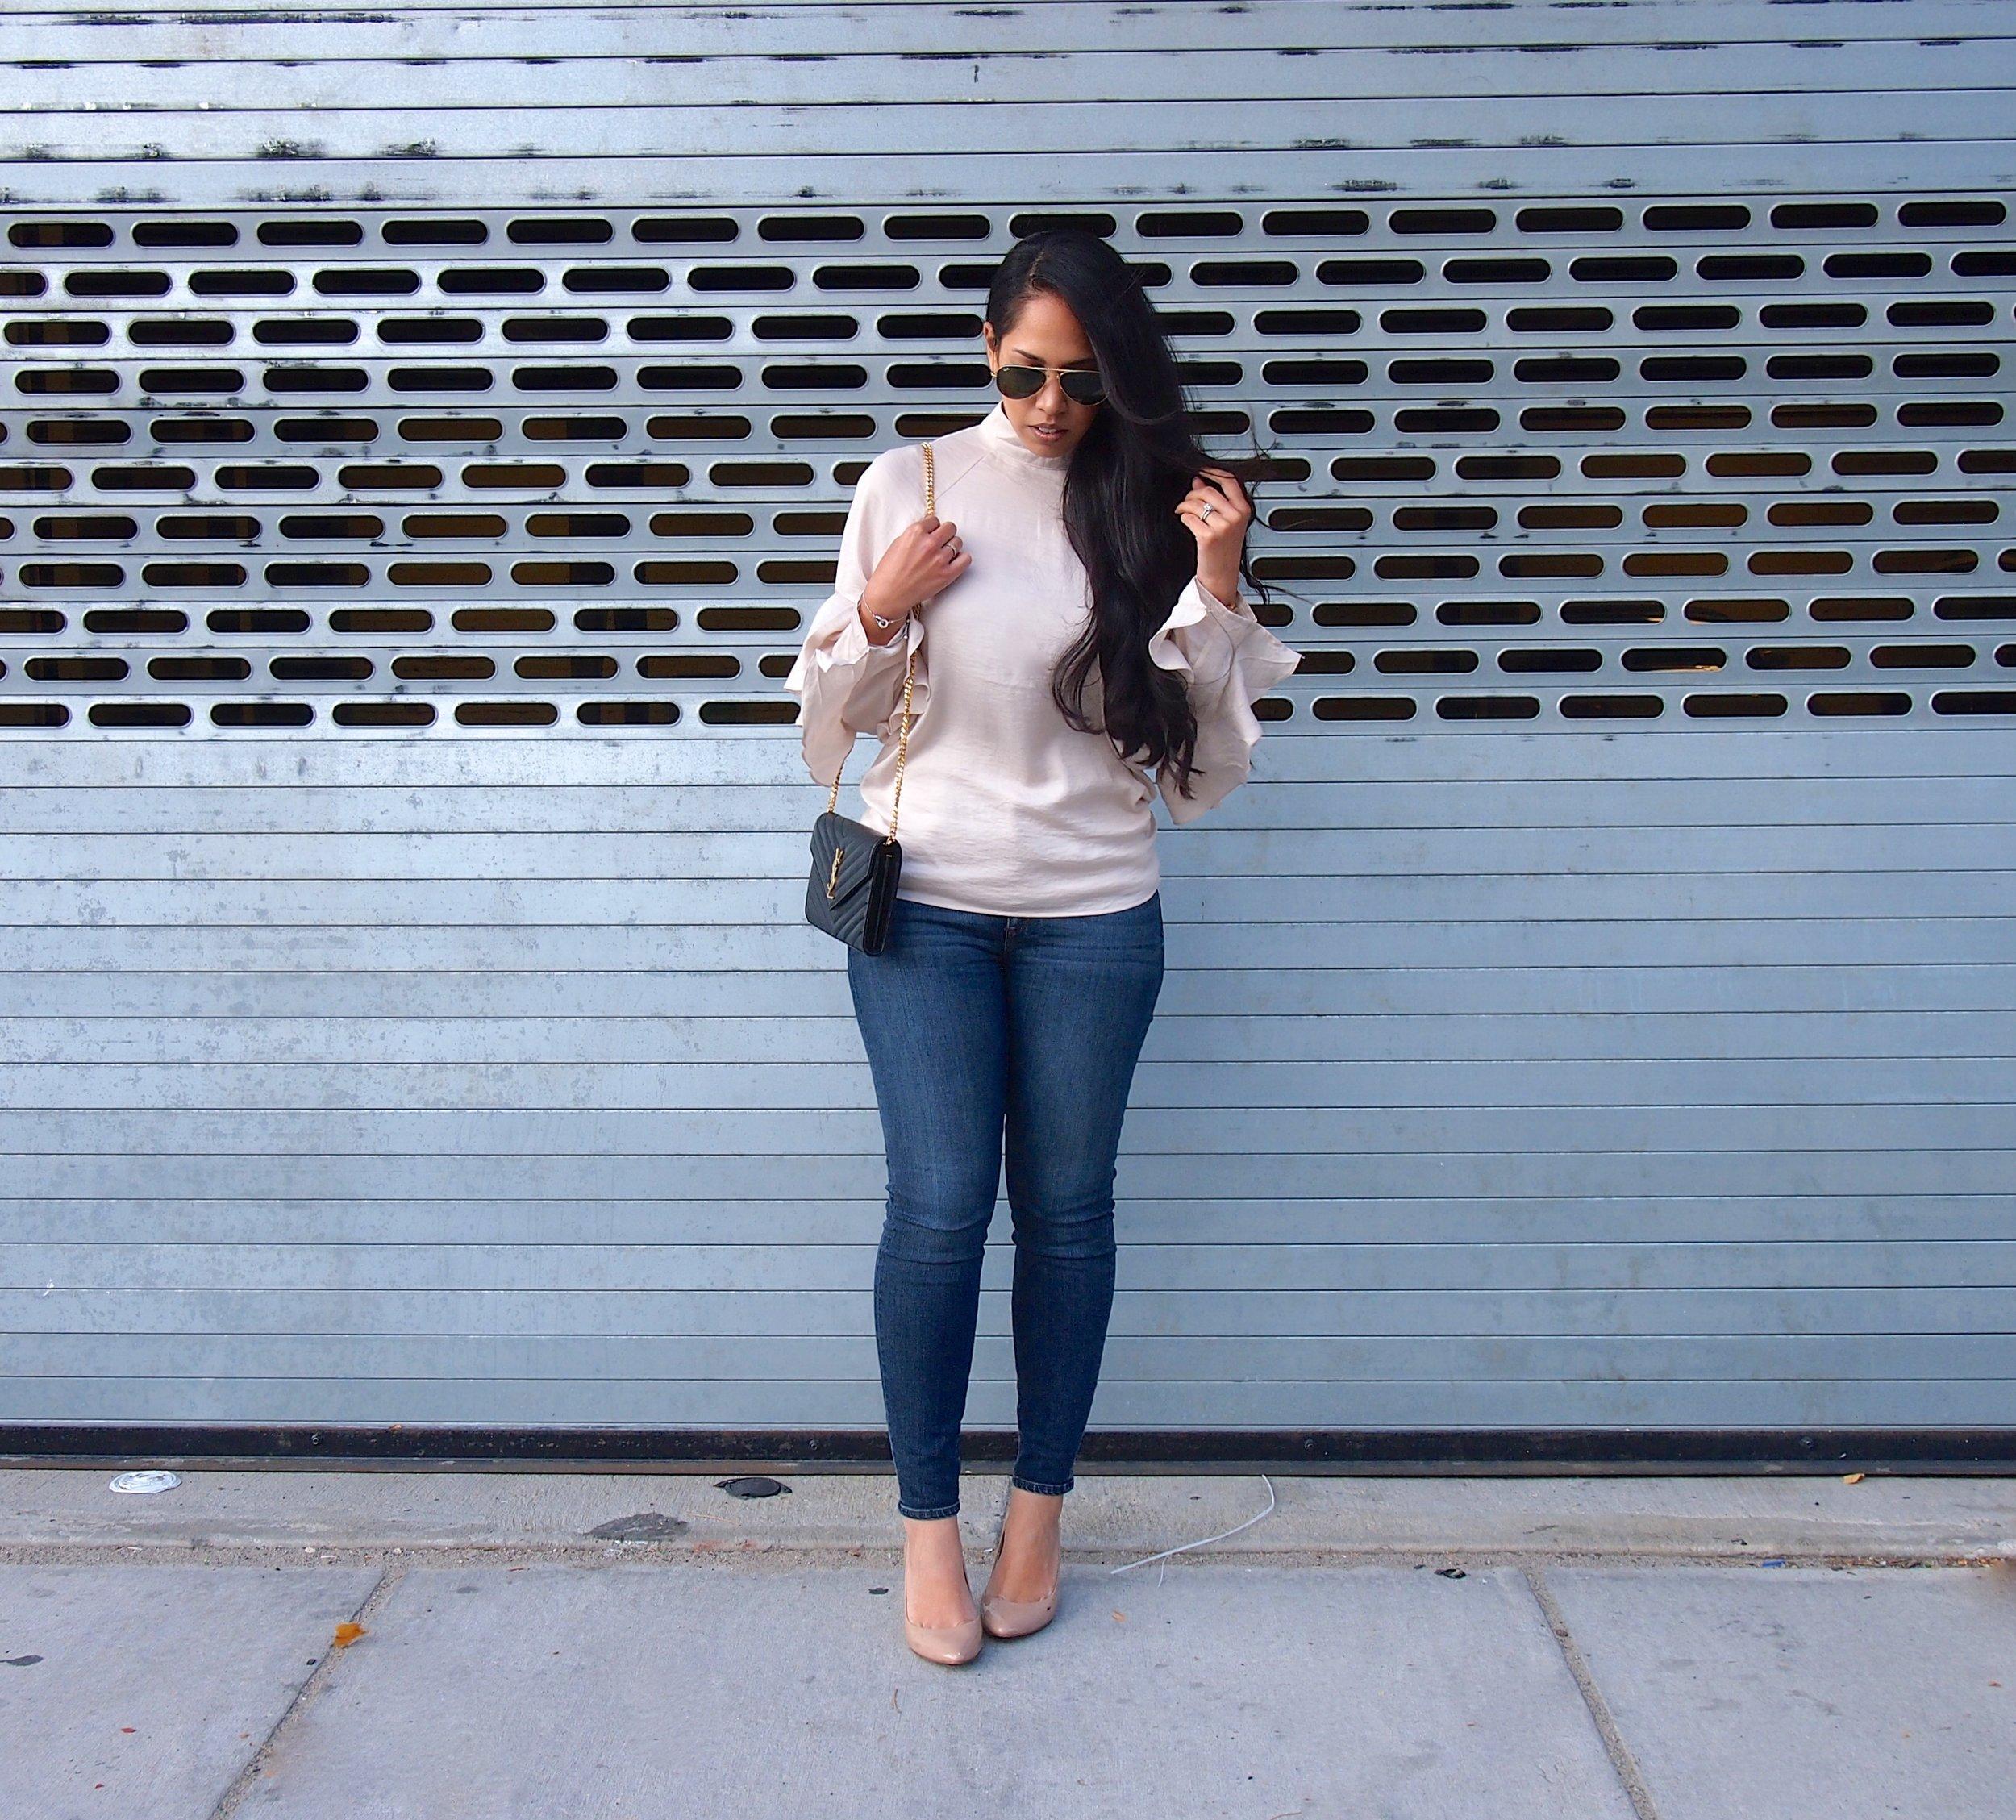 H&M-Blouse-Fall-Fashion